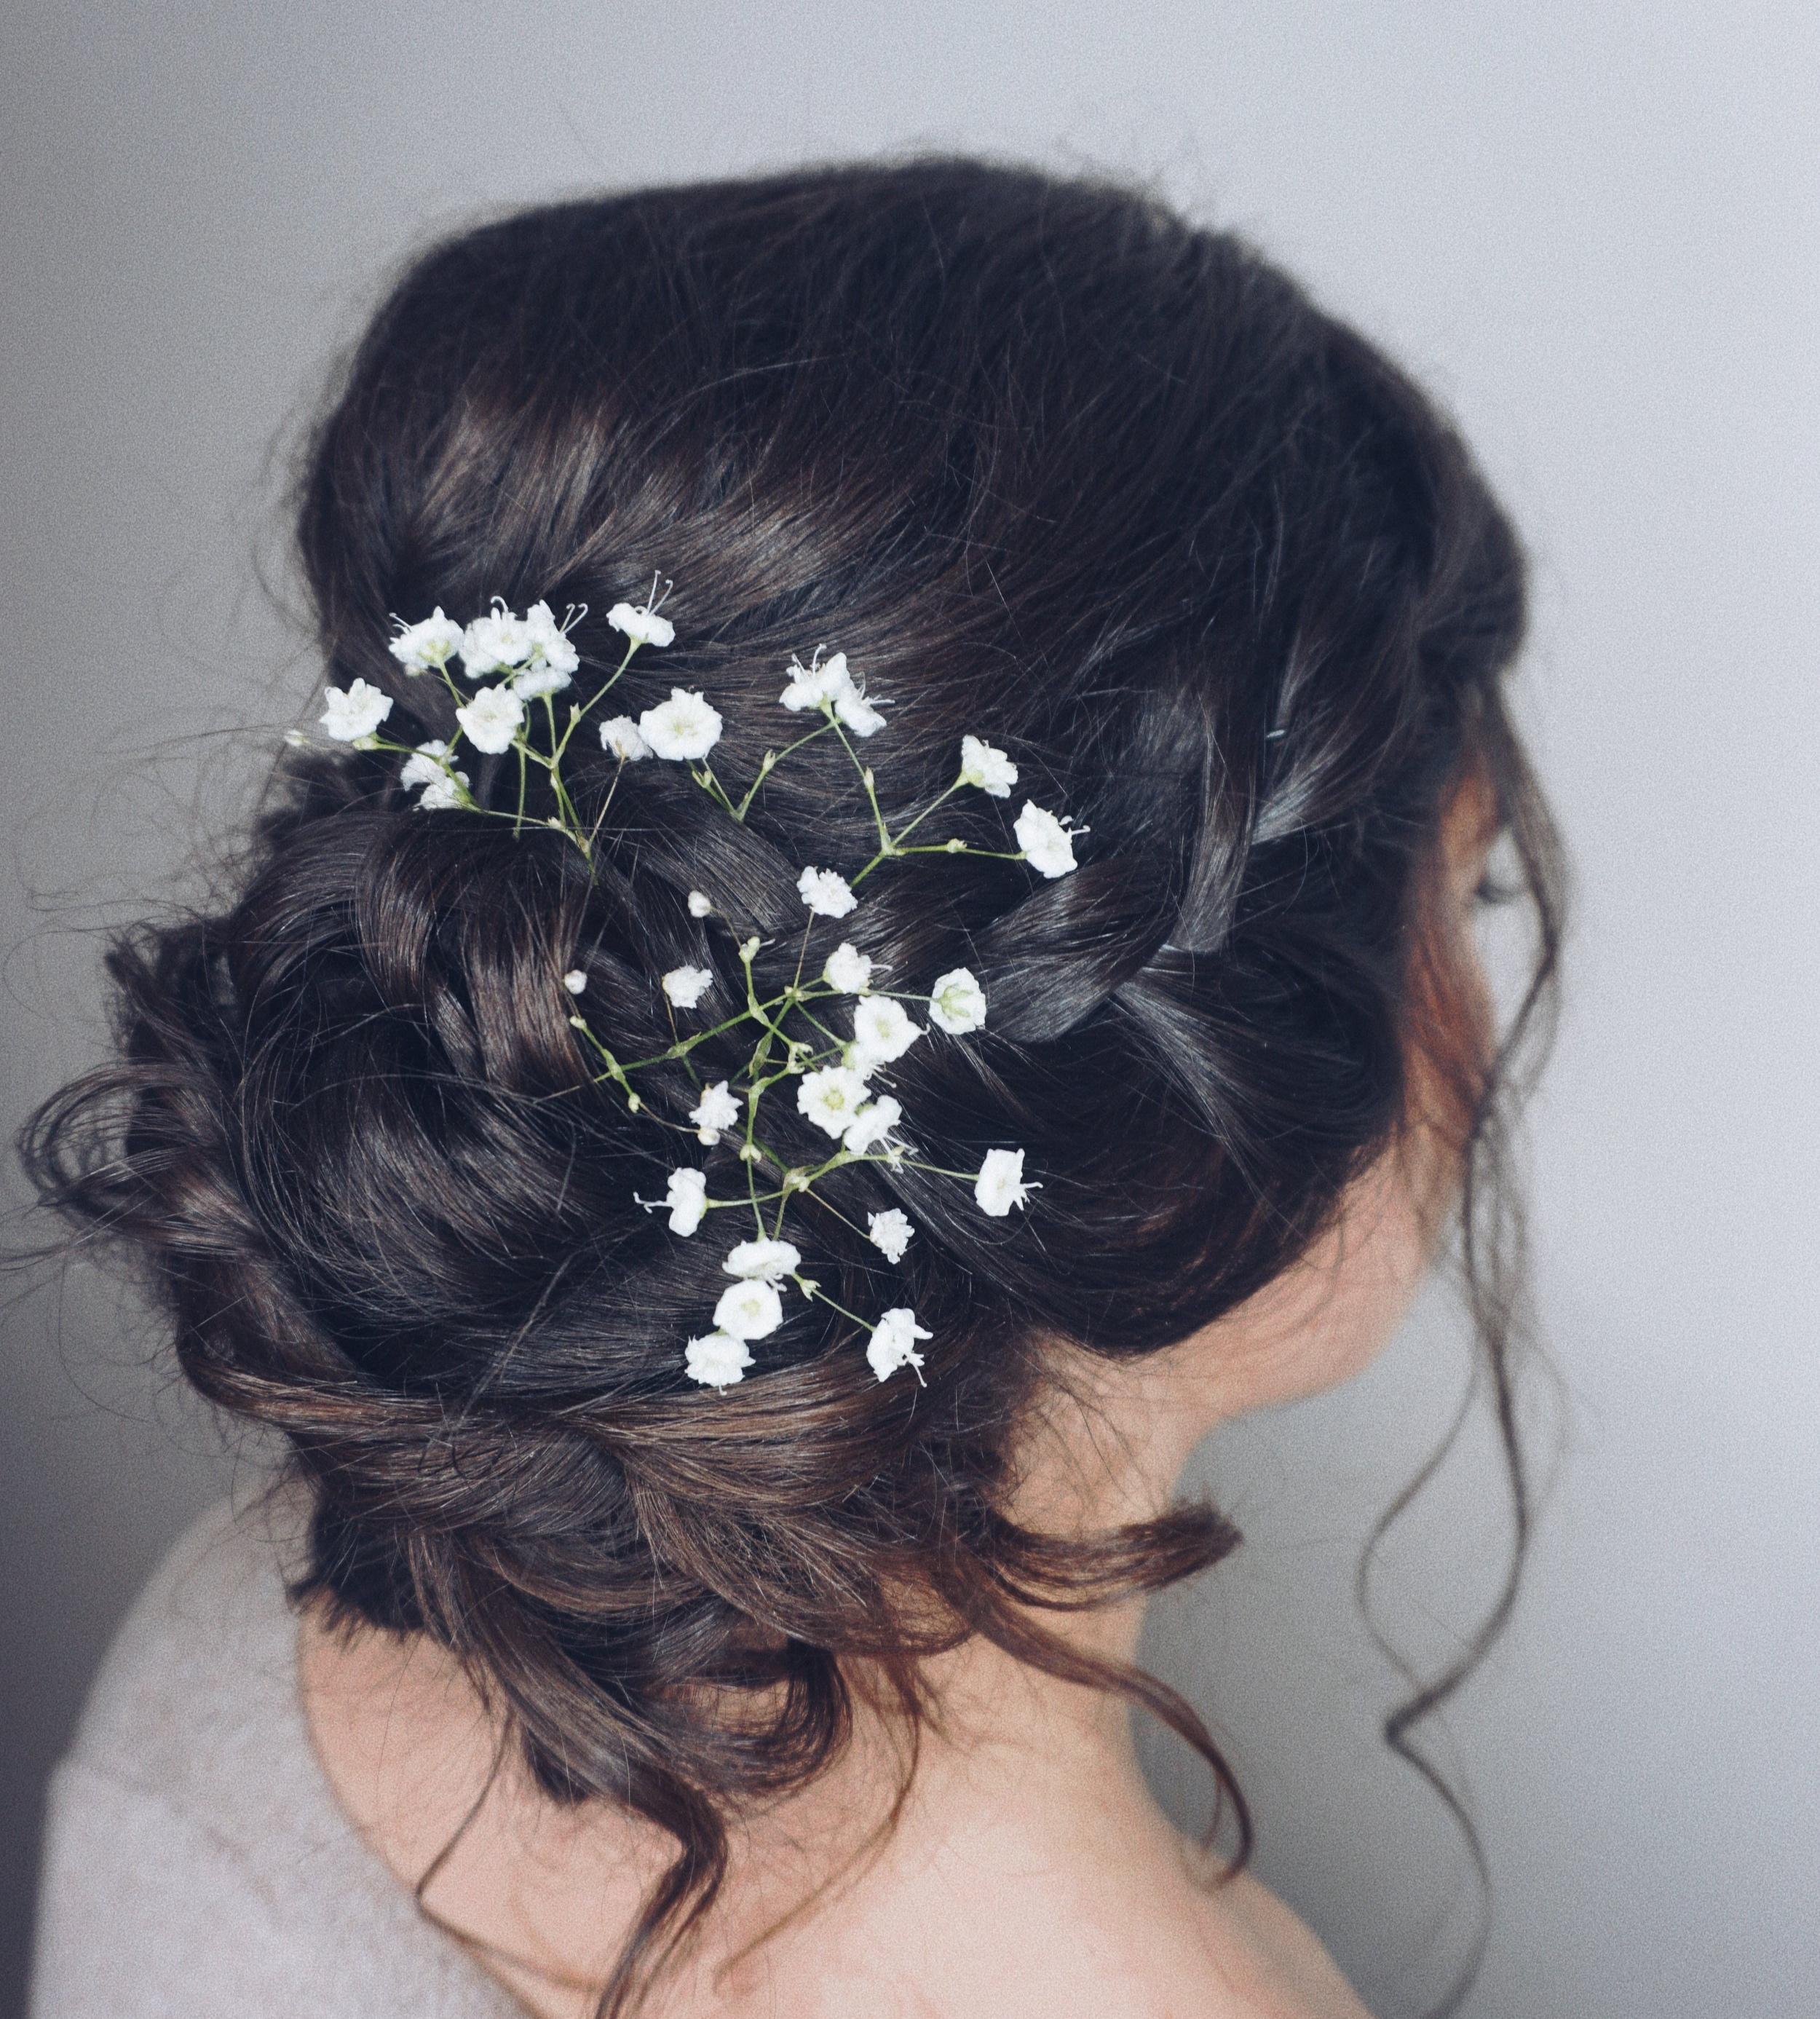 Textured side low bun with braids & florals